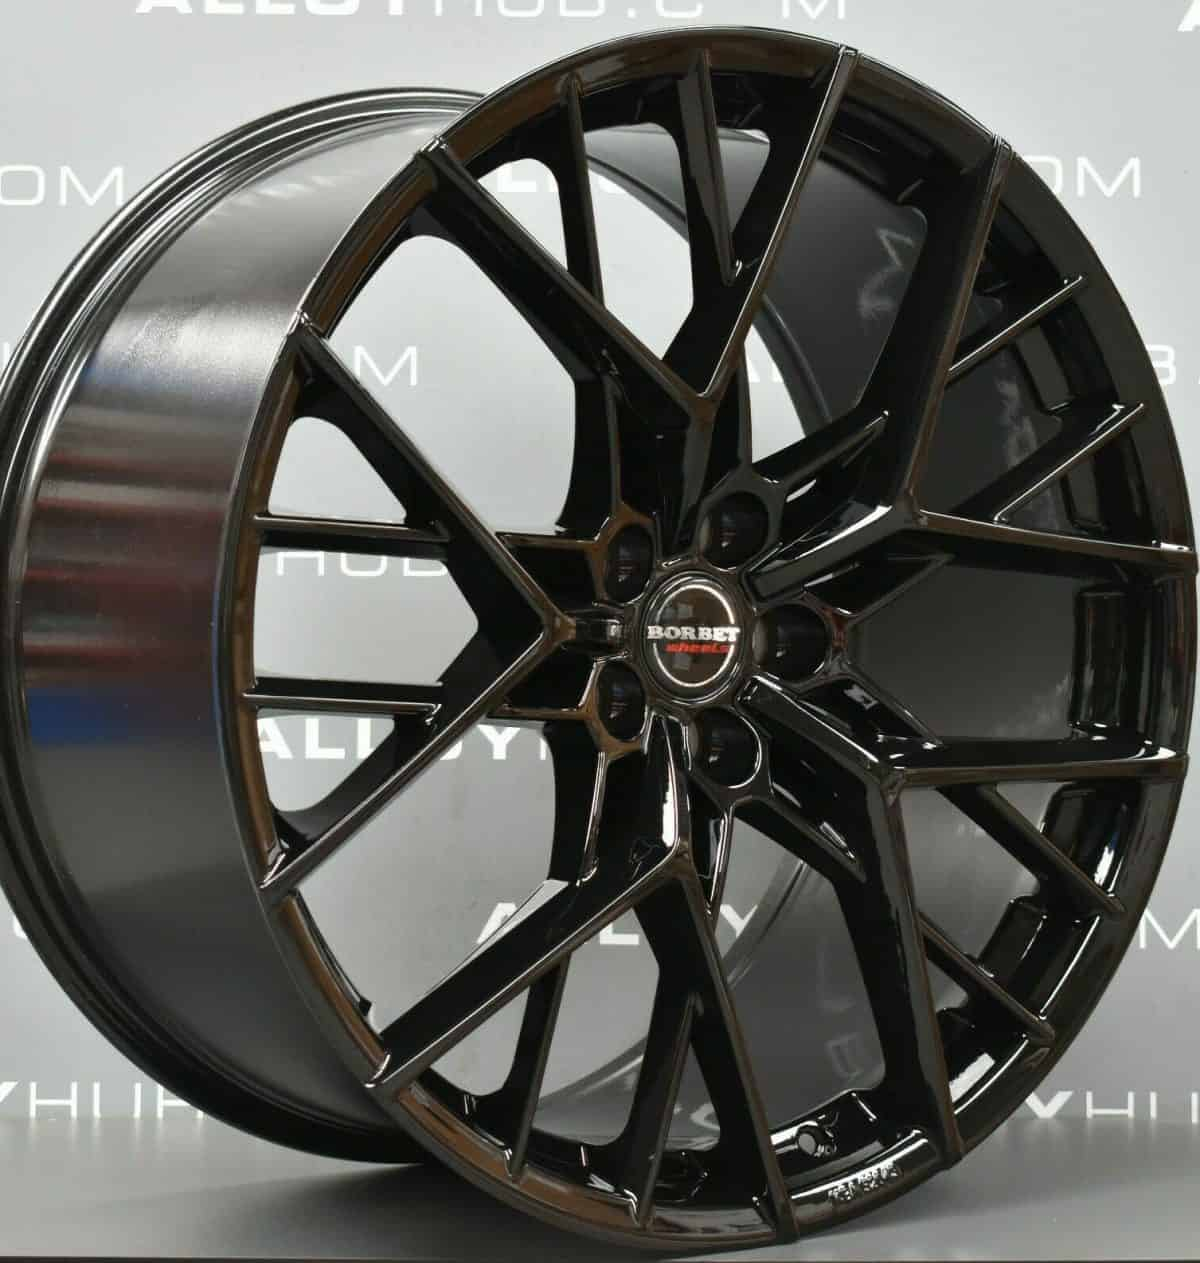 "Genuine Borbet Y Spoke 23"" inch Gloss Black Y Spoke Alloy Wheels"